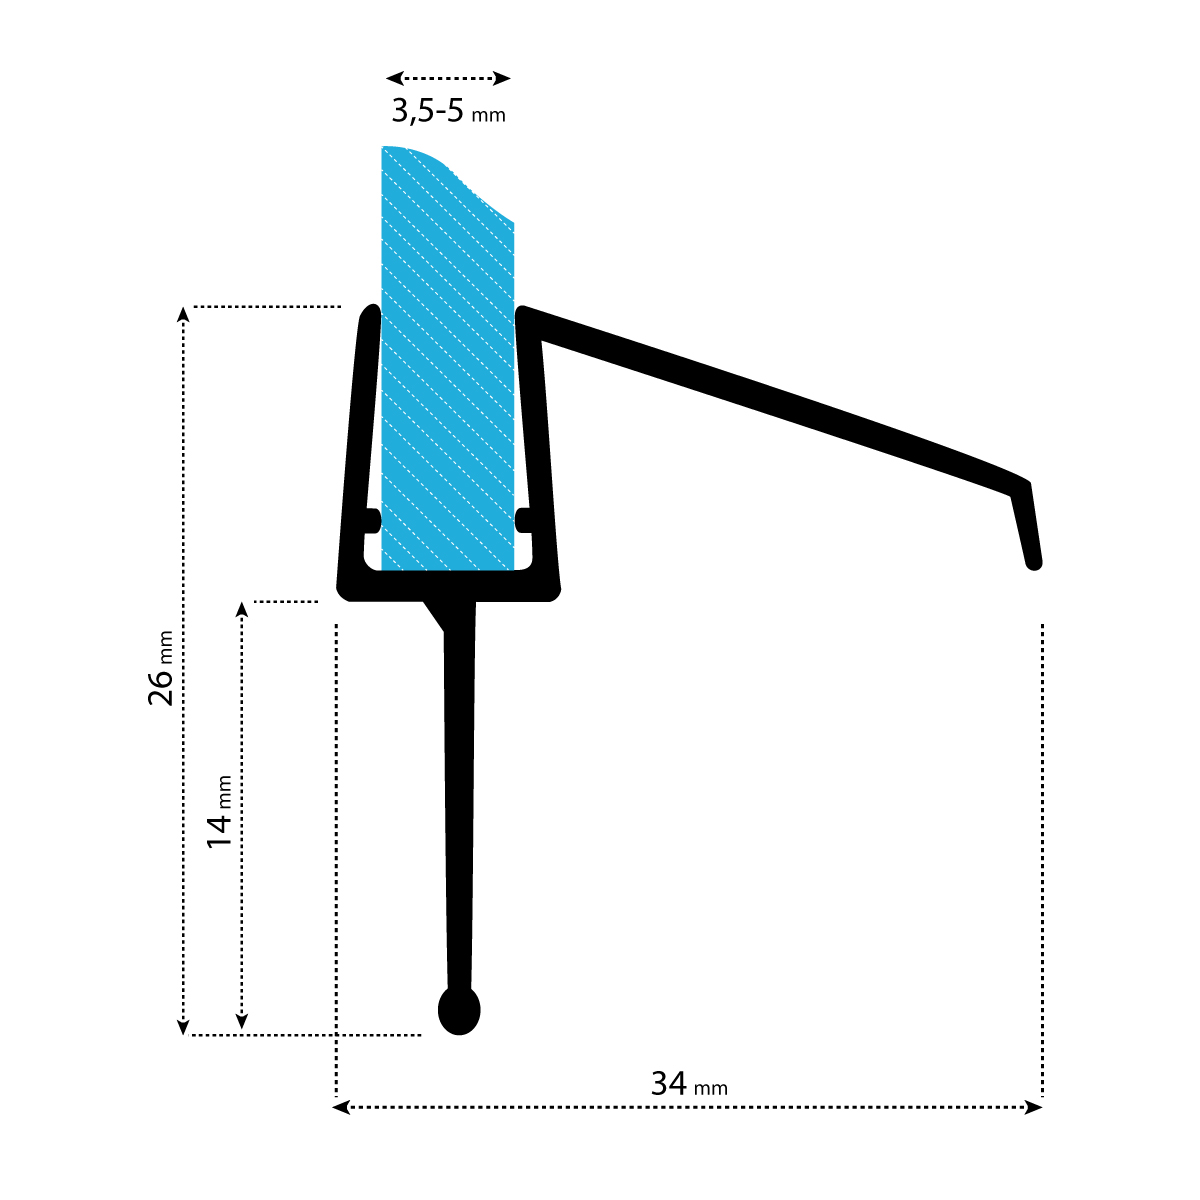 STEIGNER 190 cm Junta Repuesto Para el Vidrio 5mm//6mm Junta Vierteaguas de Ducha UK16 Protecci/ón Chorros Mamparas Ducha